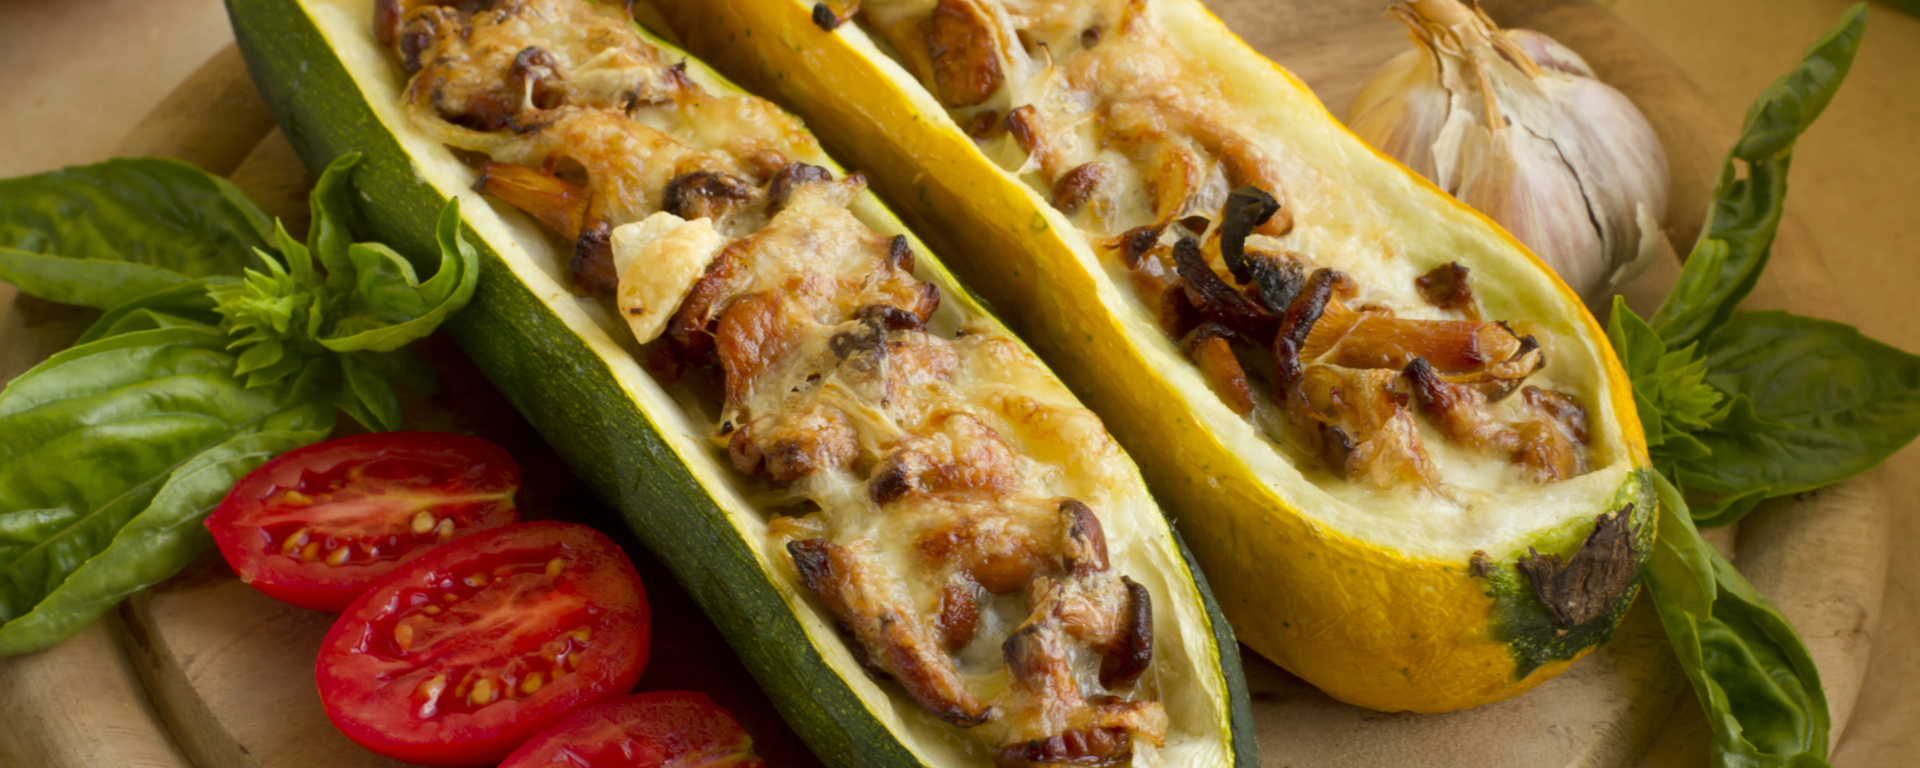 Photo for - Mushroom Stuffed Zucchini